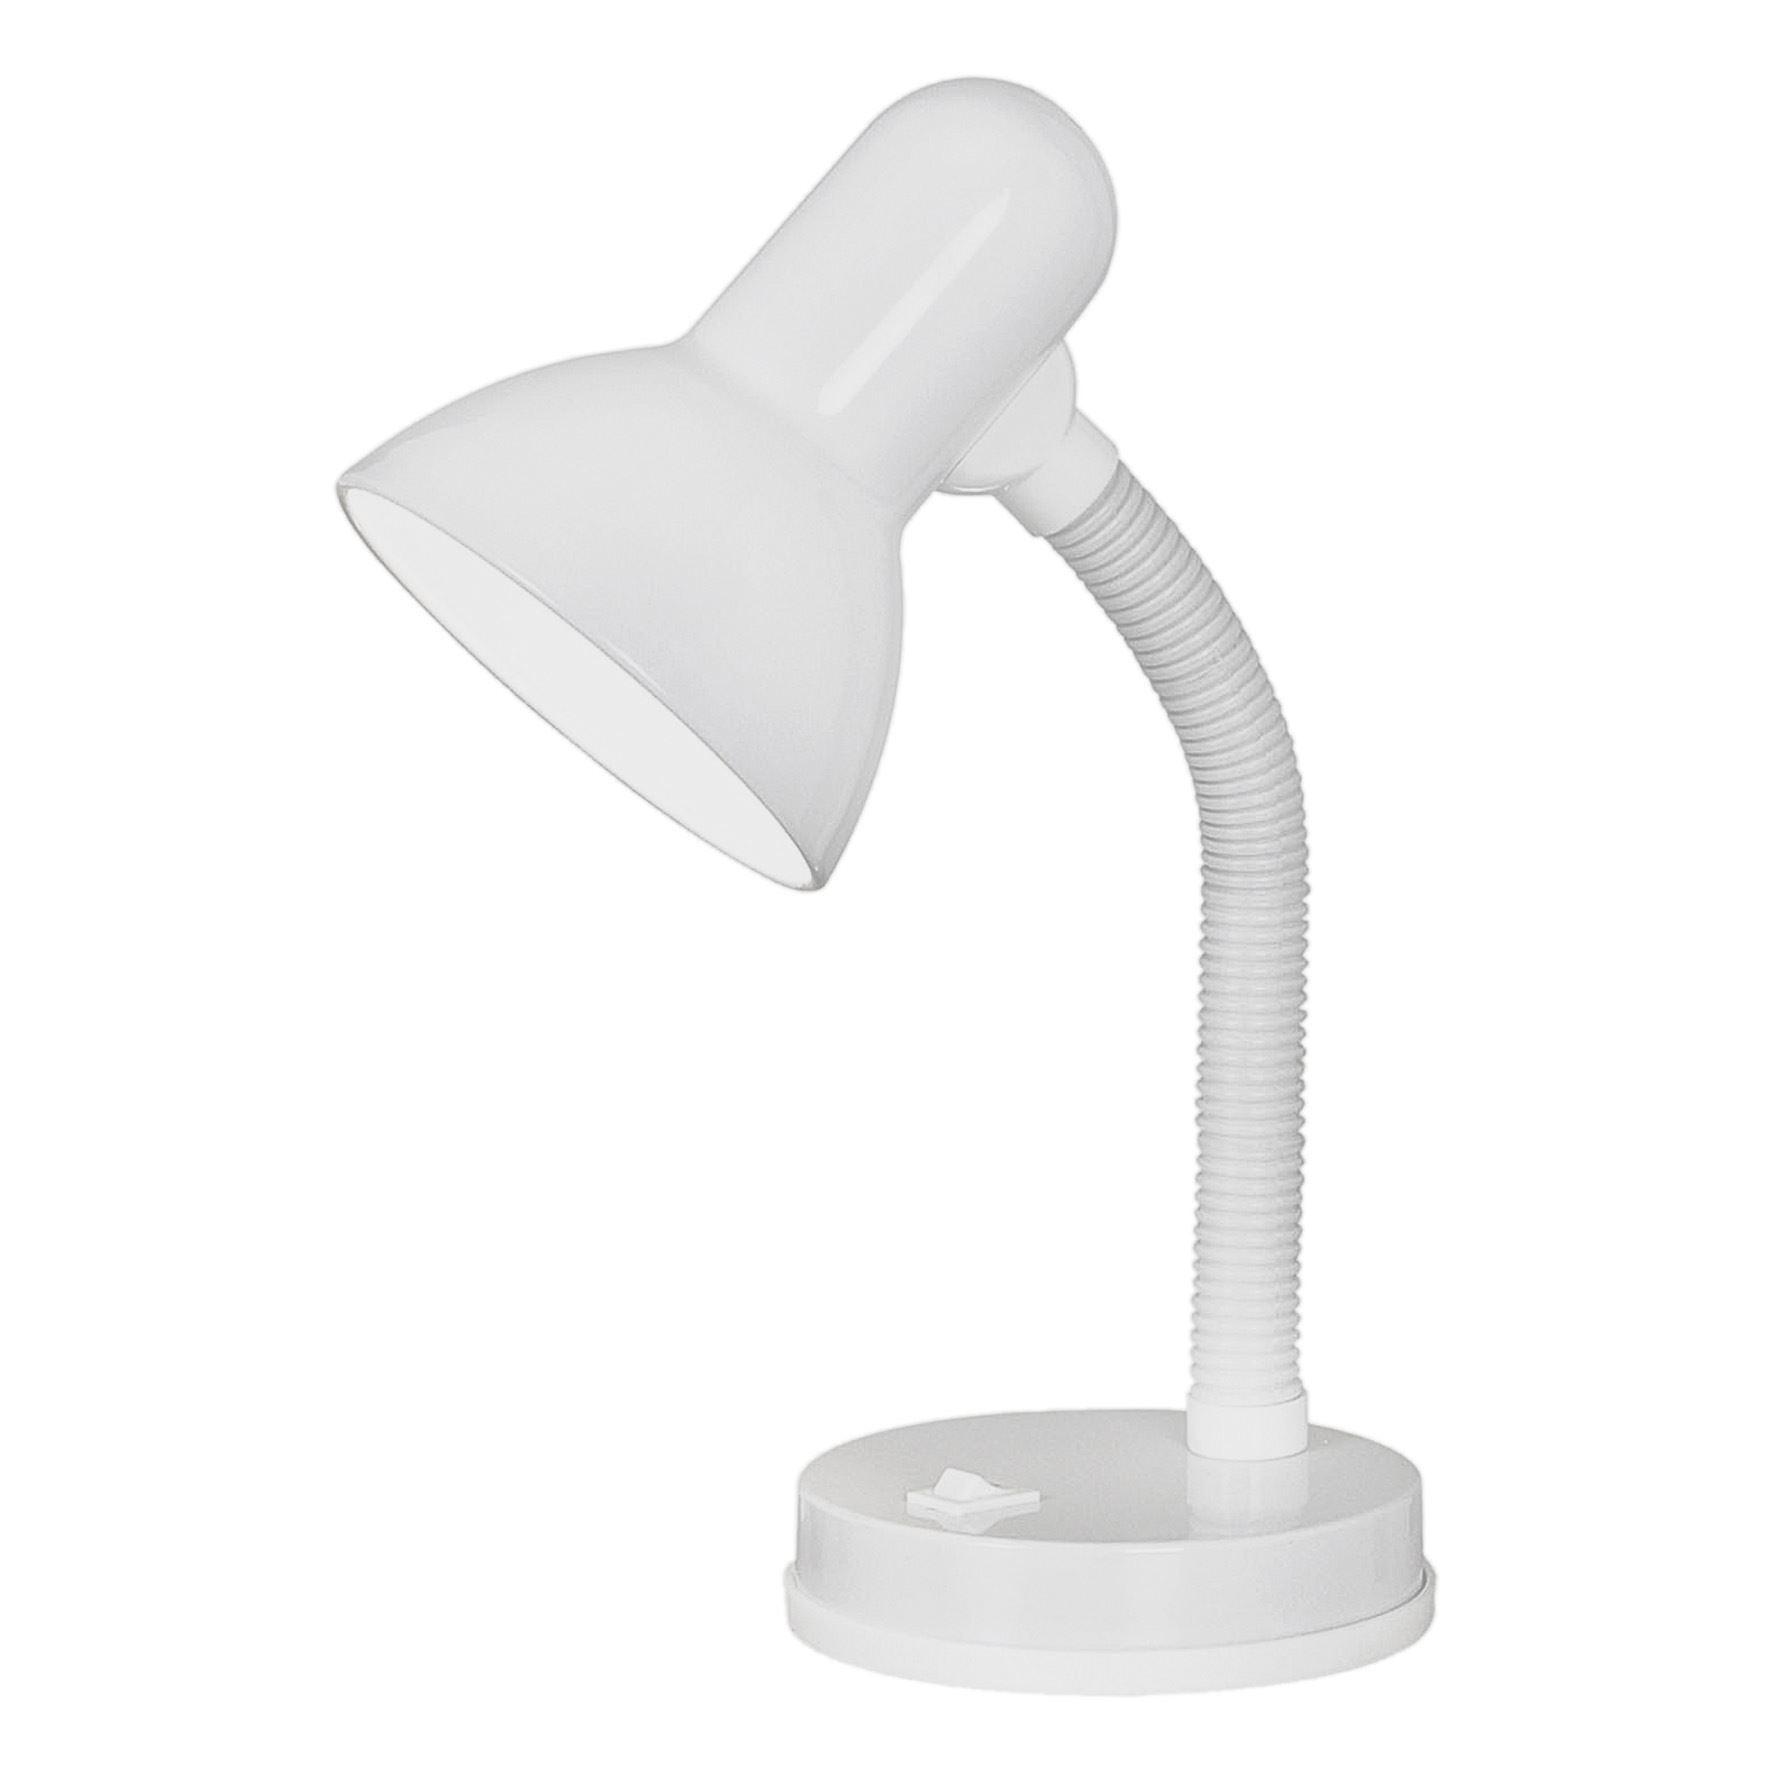 Basic Modern Table Lamp Flexible Rocker Switch - White